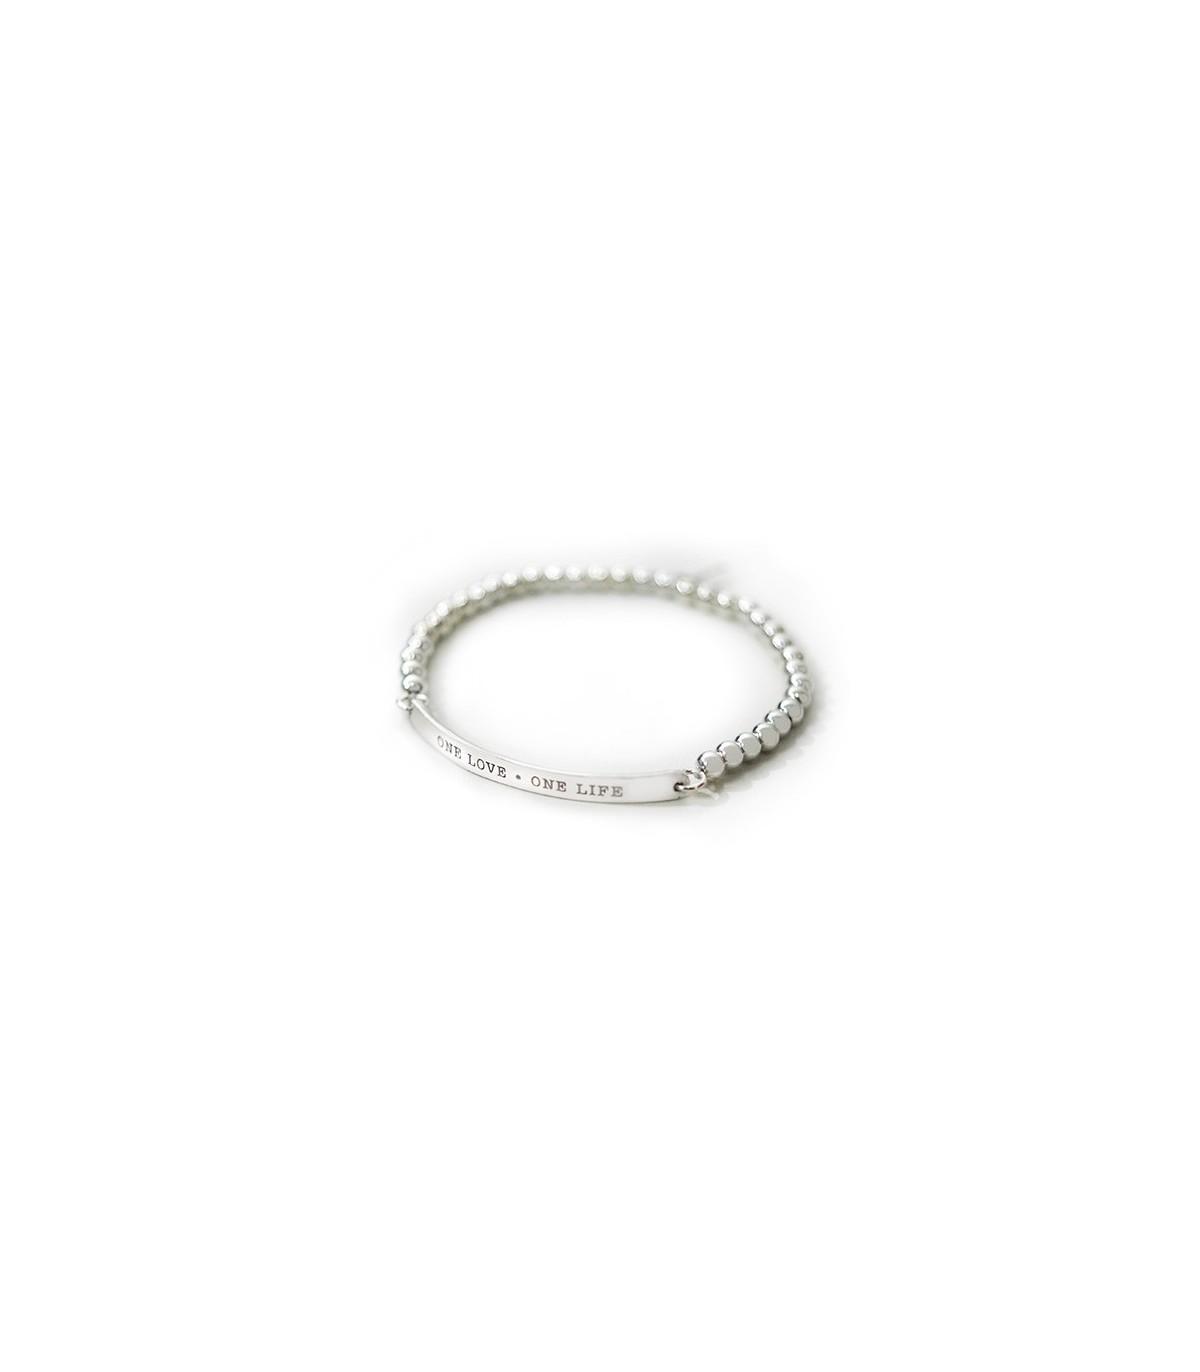 f0bf2fc56cfd Pulsera de plata personalizada Nexo bolitas. Joyas para mujer